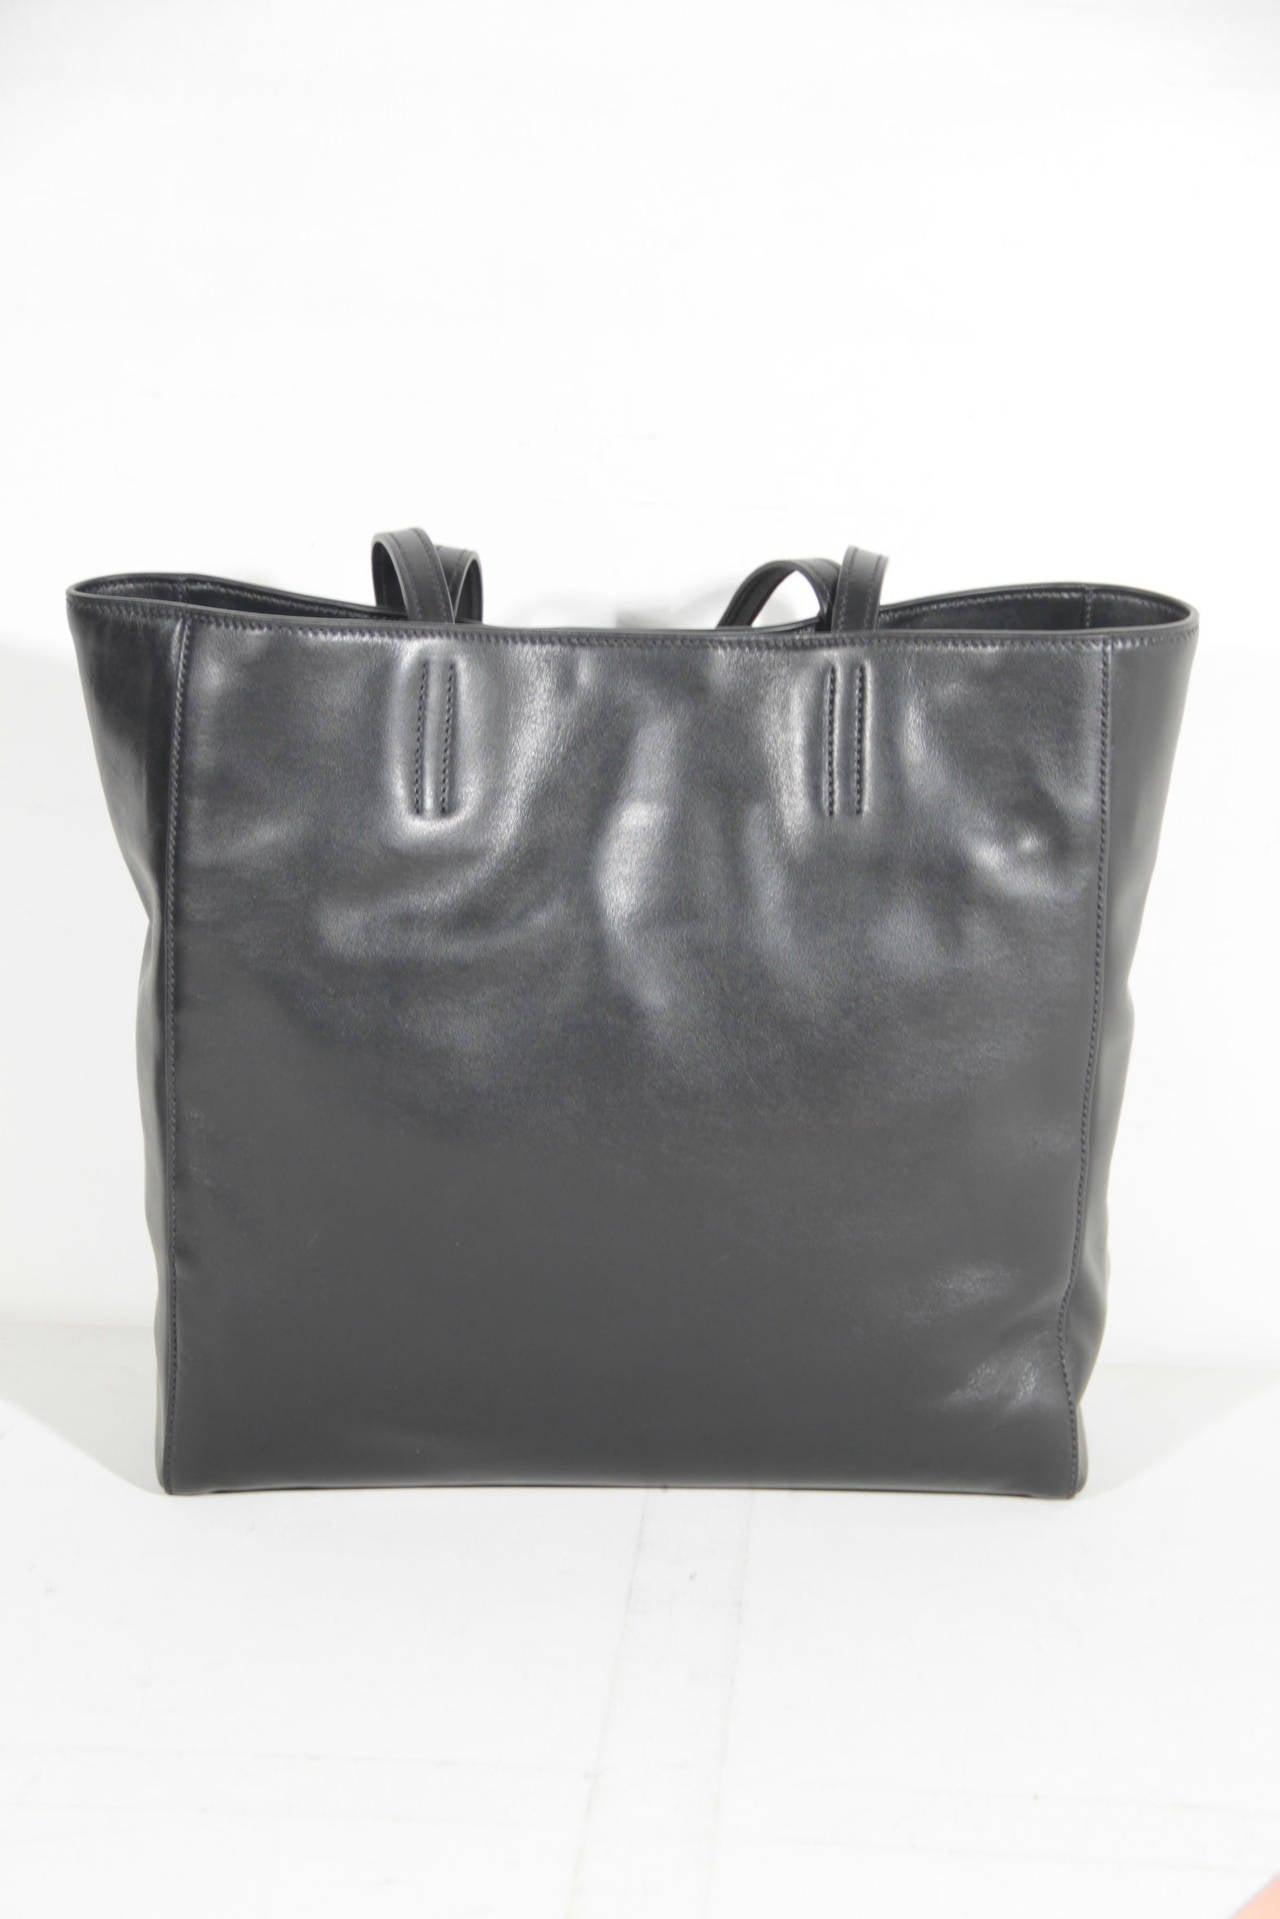 f3f50df72362 Gray MIU MIU PRADA Black SOFT CALF Leather SHOPPING BAG Tote HANDBAG R1914S  For Sale